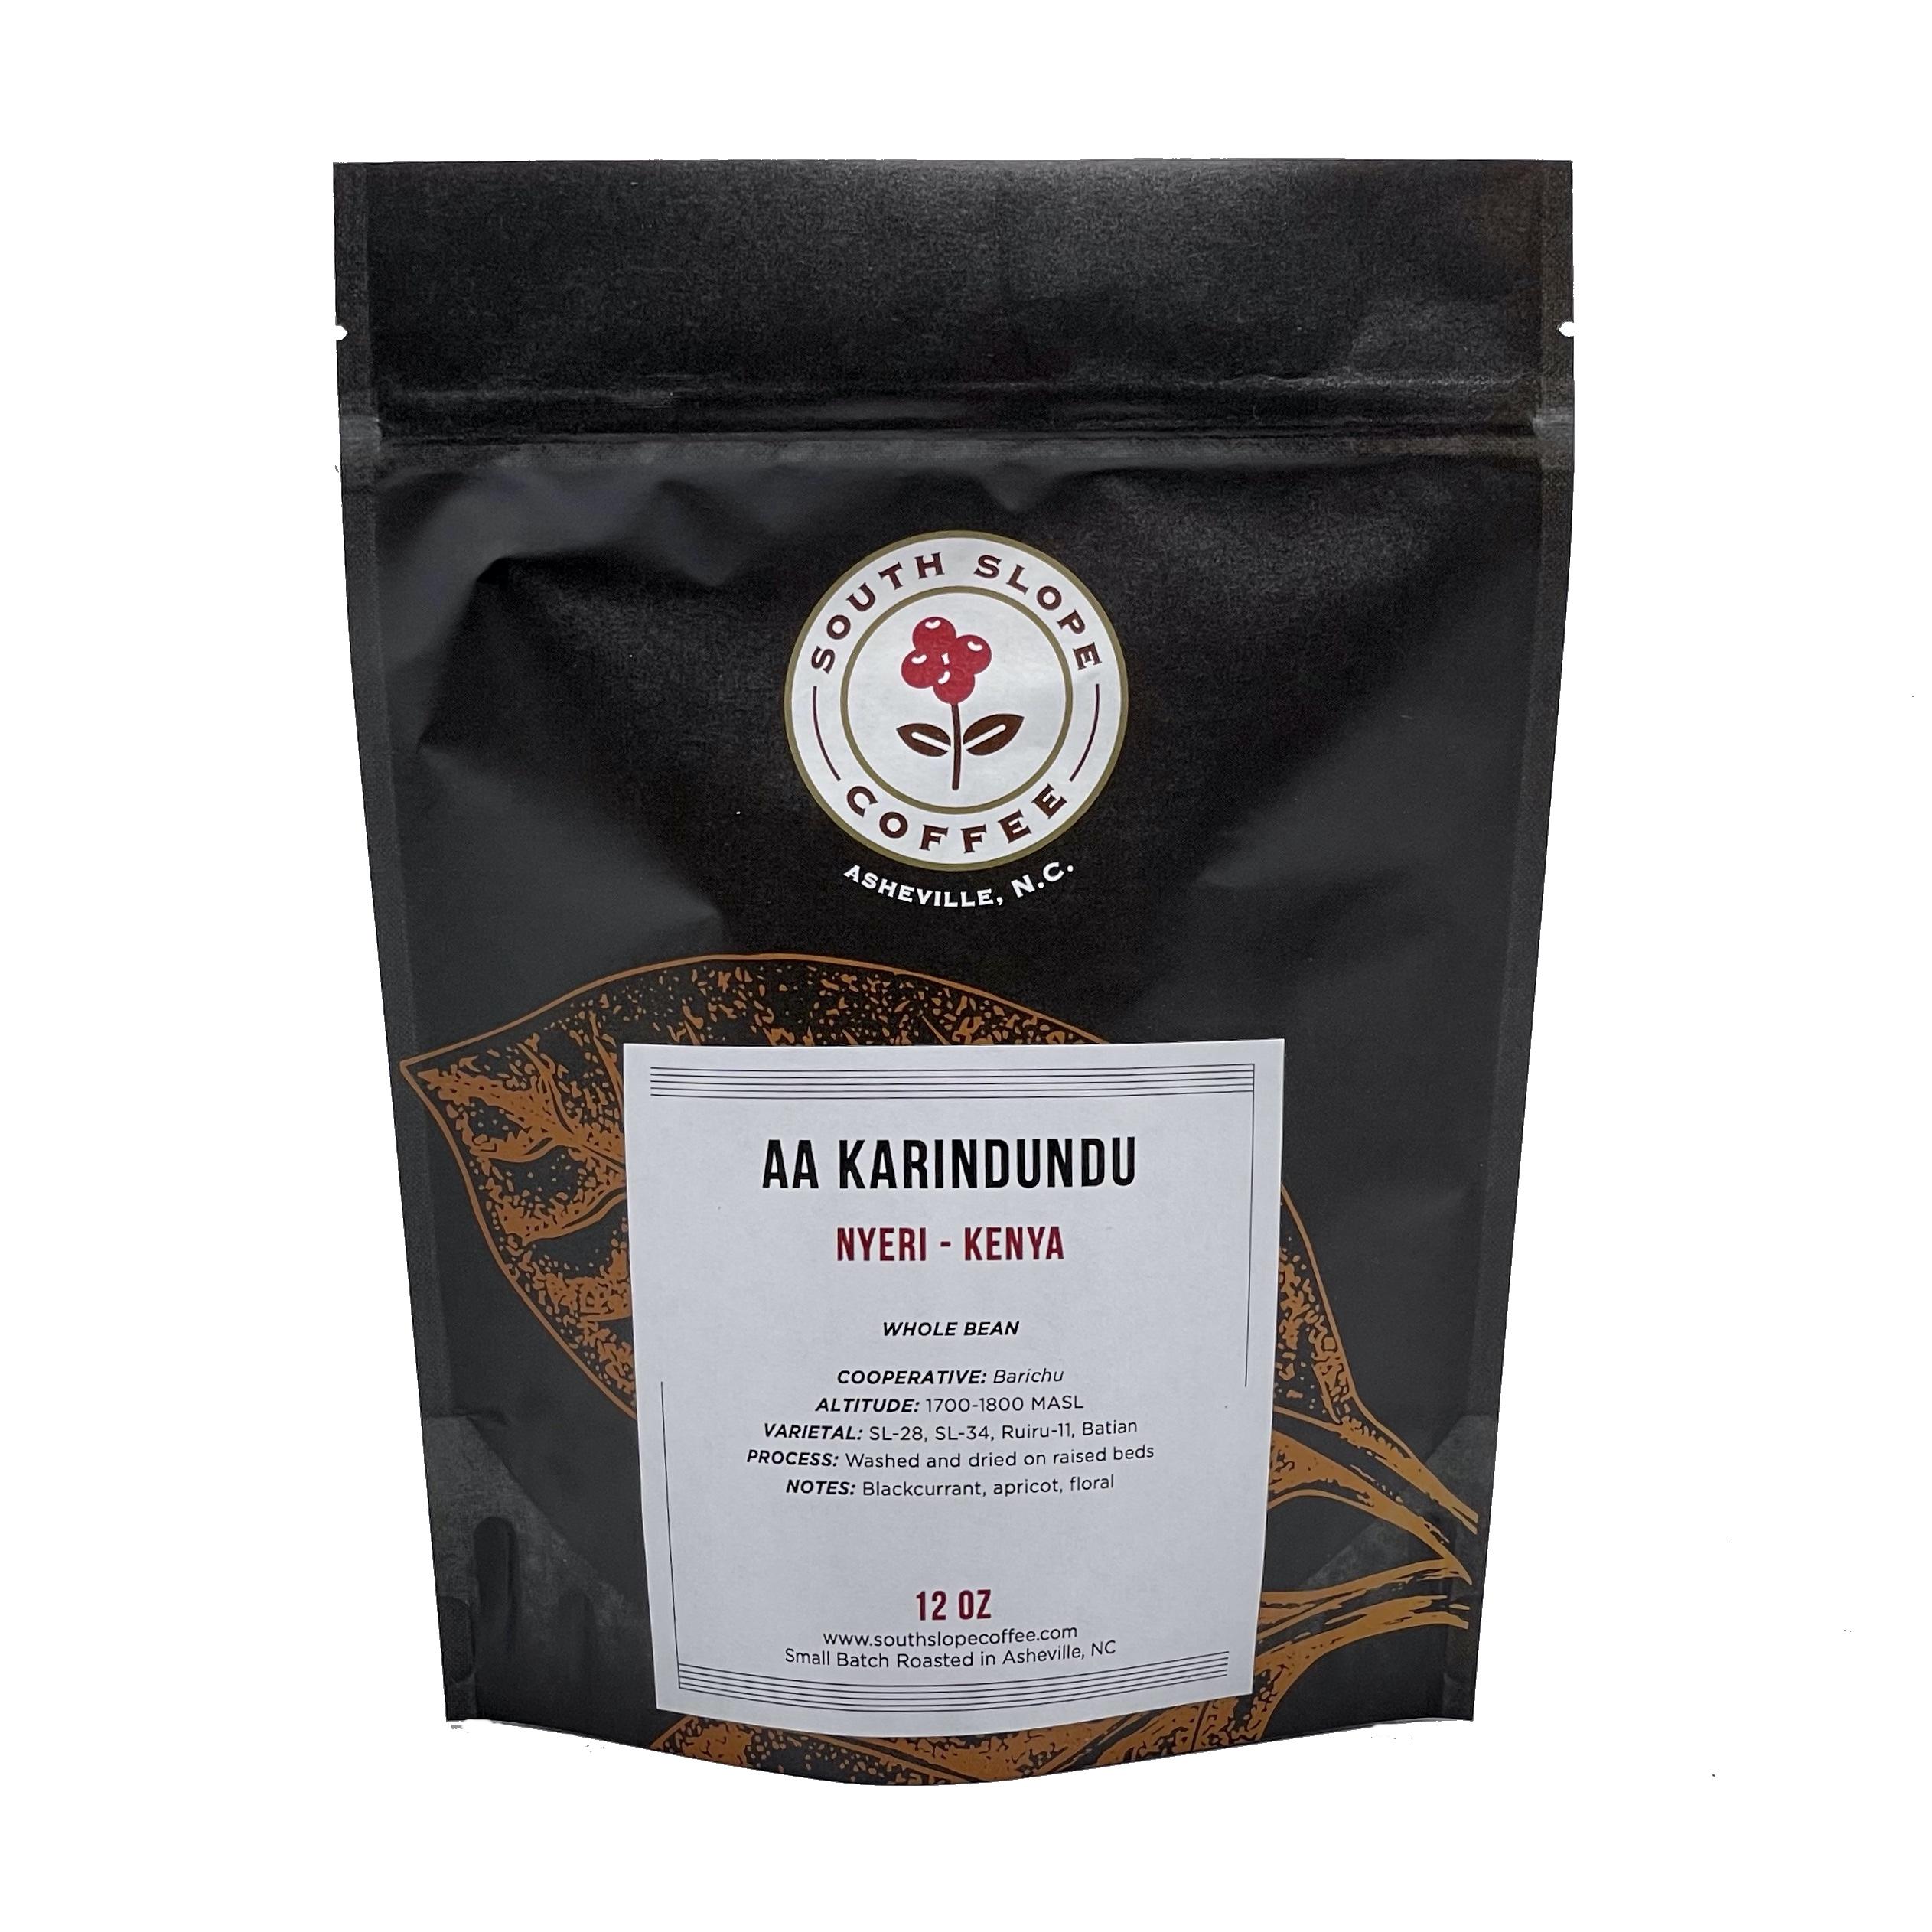 12 Ounce bag of coffee roasted by south slop coffee from kenya kirandundu cooperative in Nyeri